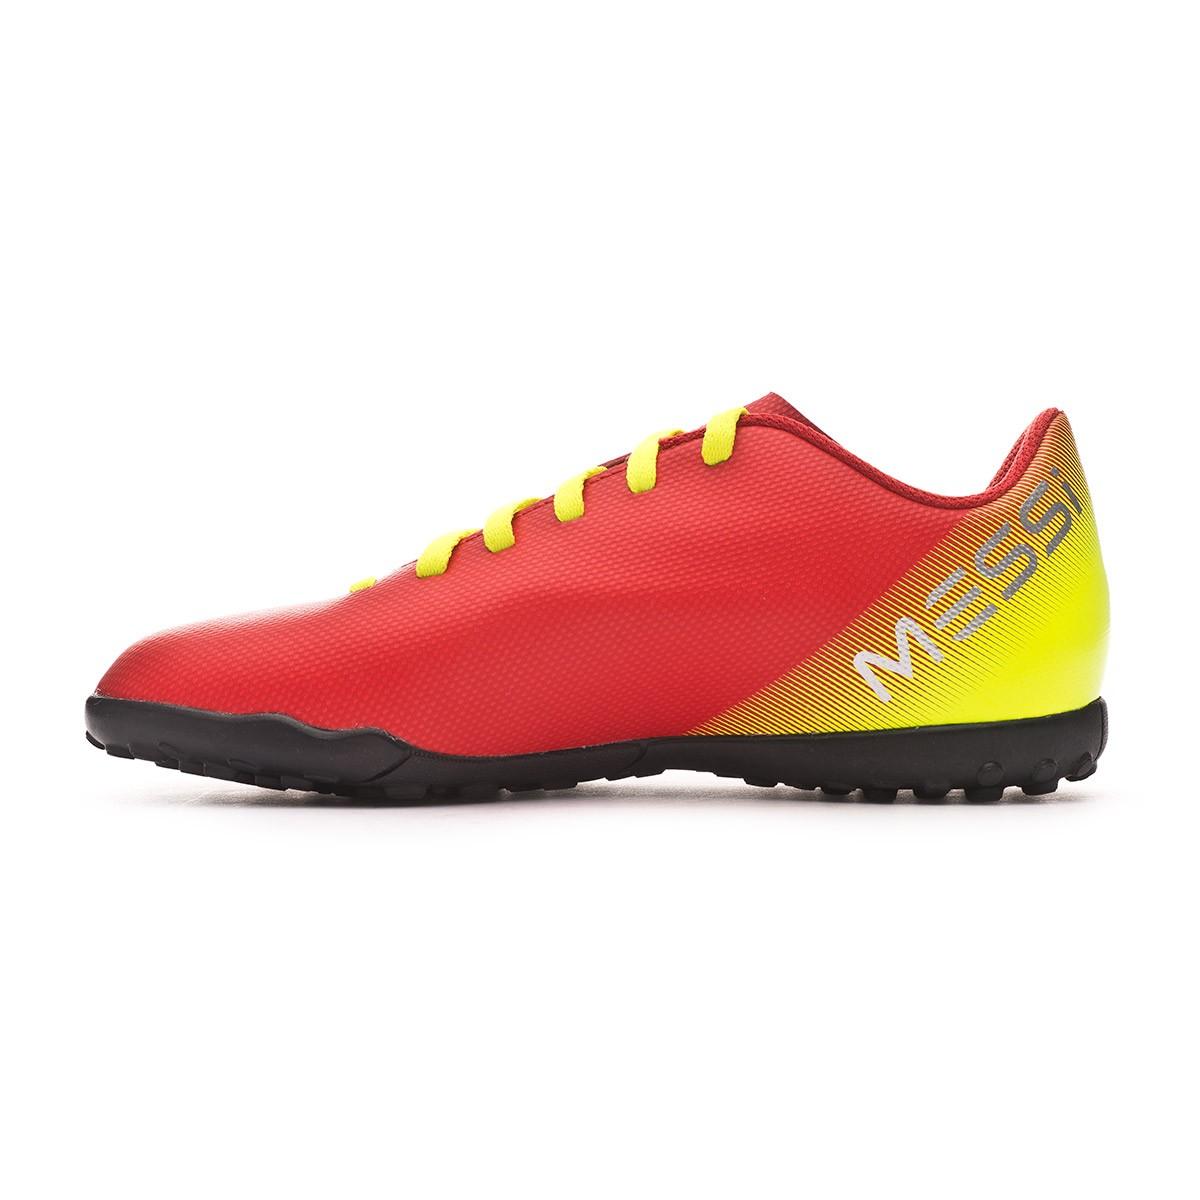 de105460080a Football Boot adidas Kids Nemeziz Messi Tango 18.4 Turf Active  red-Silberfoil-Football blue - Tienda de fútbol Fútbol Emotion